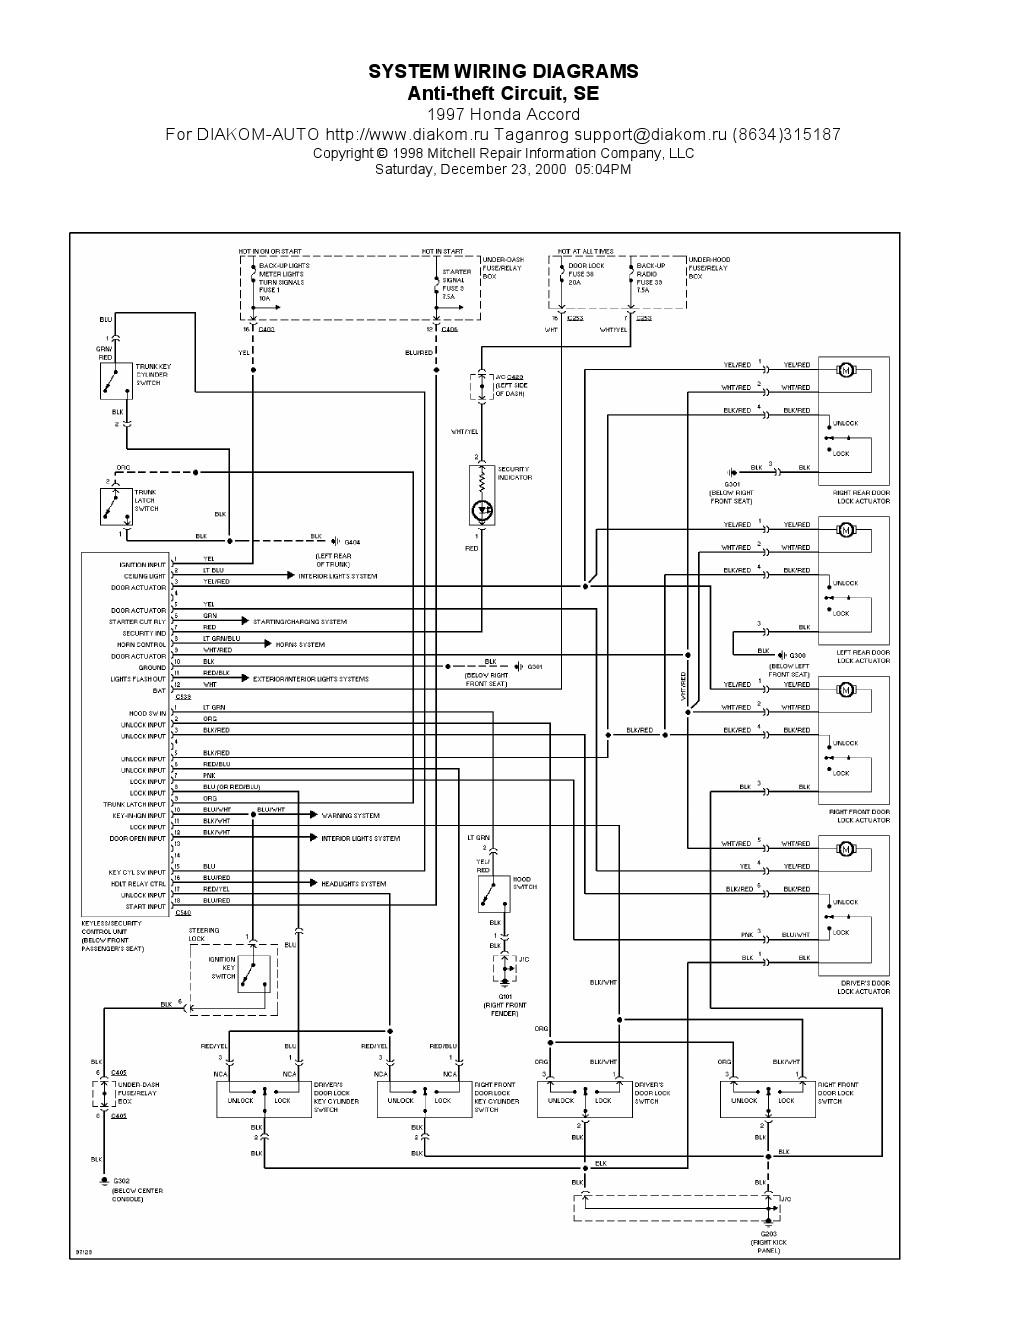 Wiring Diagram Honda Odyssey 2002 Hood Lock Trusted Diagrams 2012 Accord Lead Custom U2022 Motorcycles Shadow 500